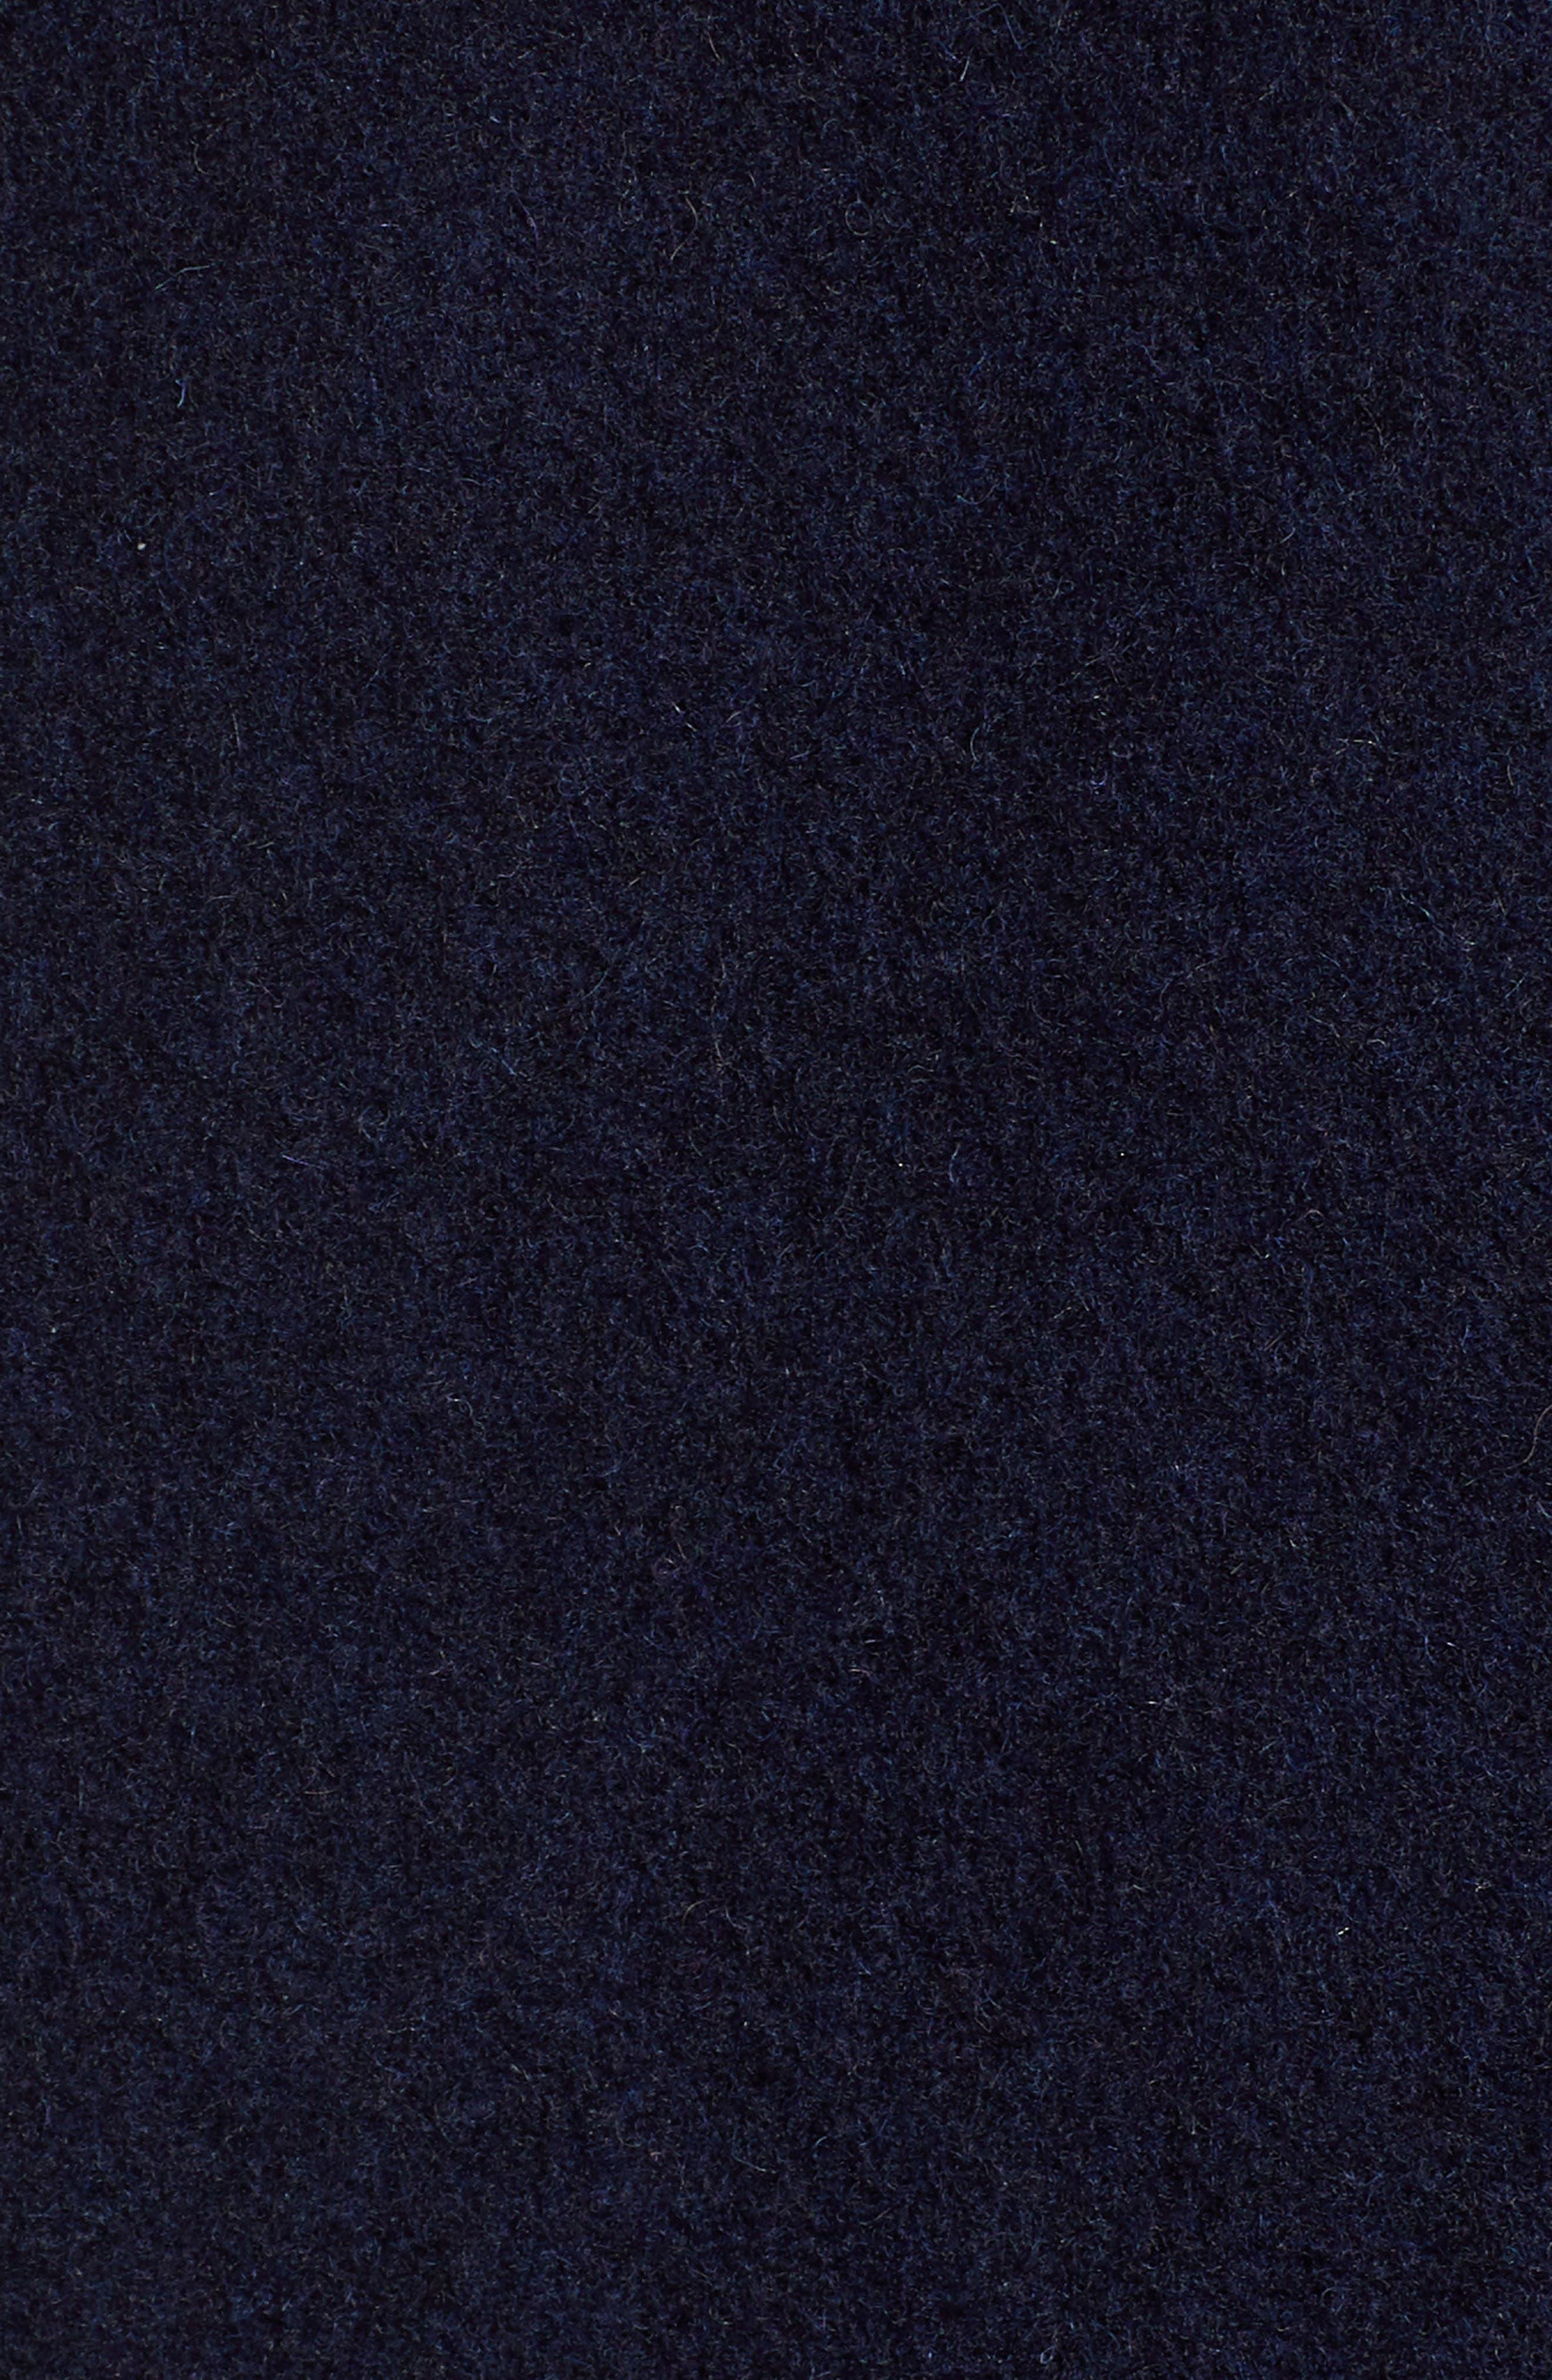 x Atlantic-Pacific Wrap Pencil Skirt,                             Alternate thumbnail 5, color,                             NAVY BLAZER